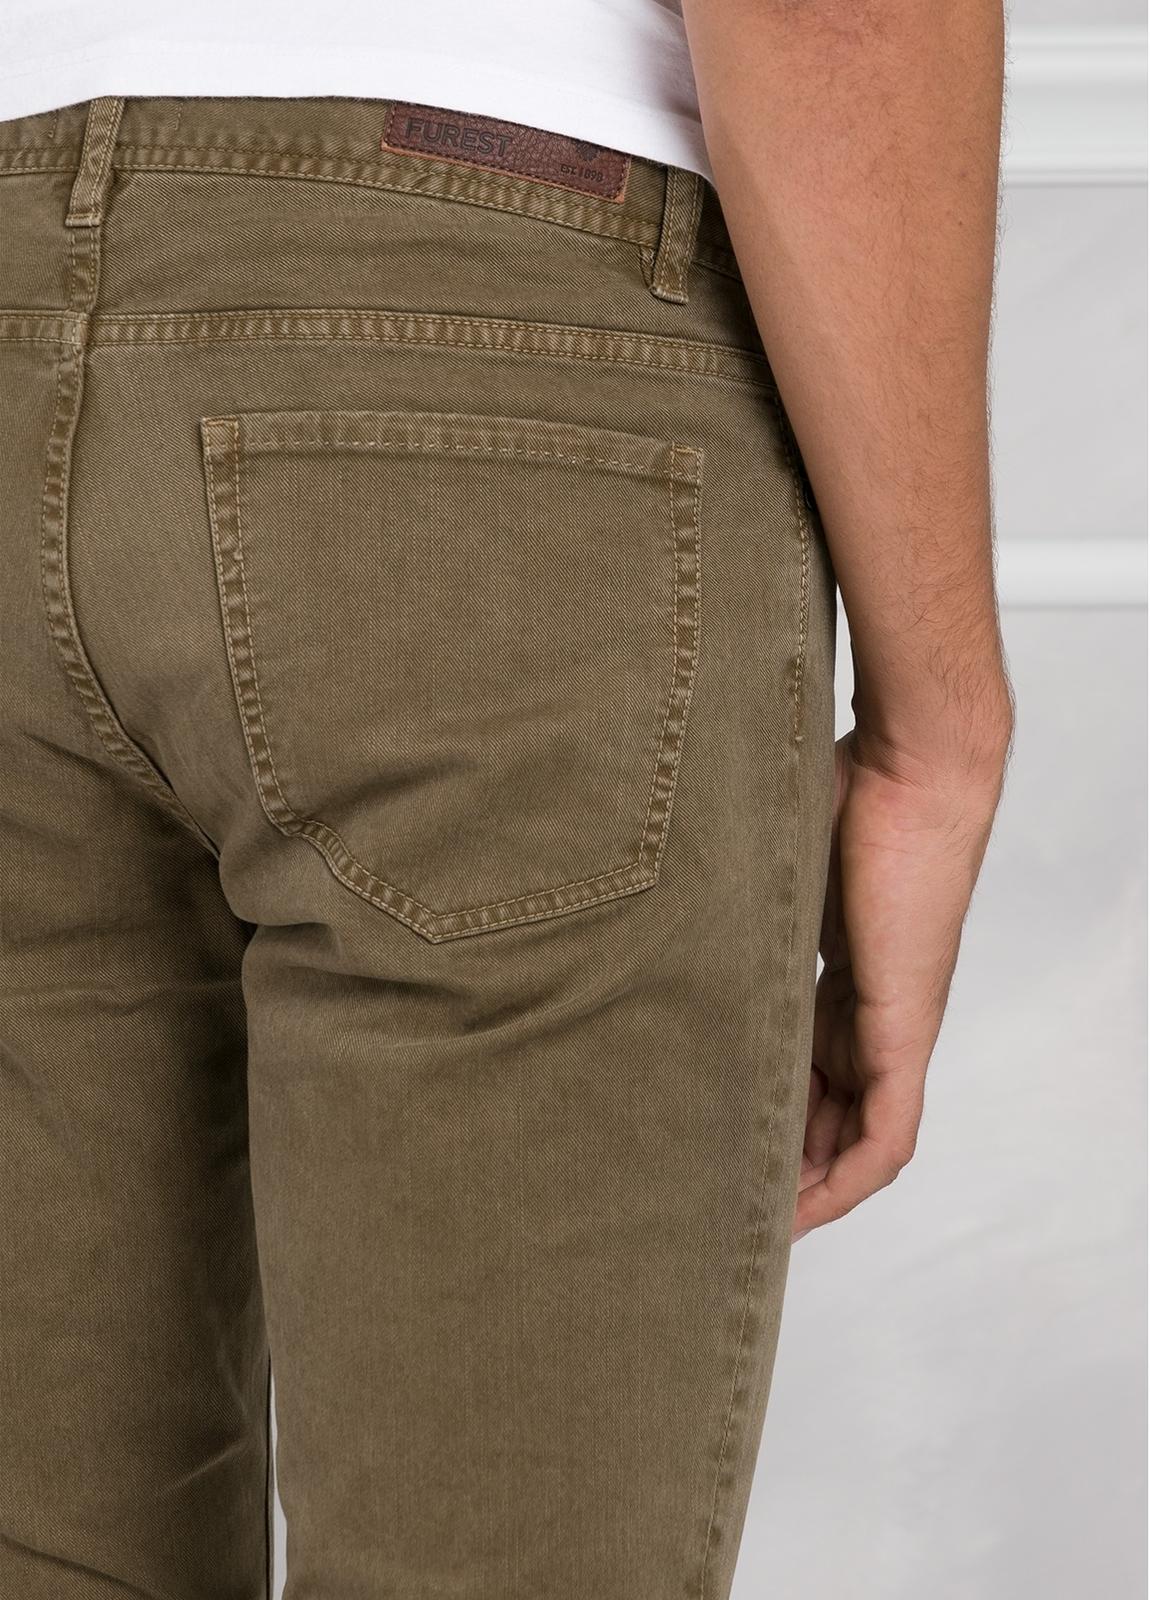 Pantalón 5 bolsillos SLIM FIT modelo FRED 75 color tostado. 97% Algodón 3% Elastán. - Ítem3